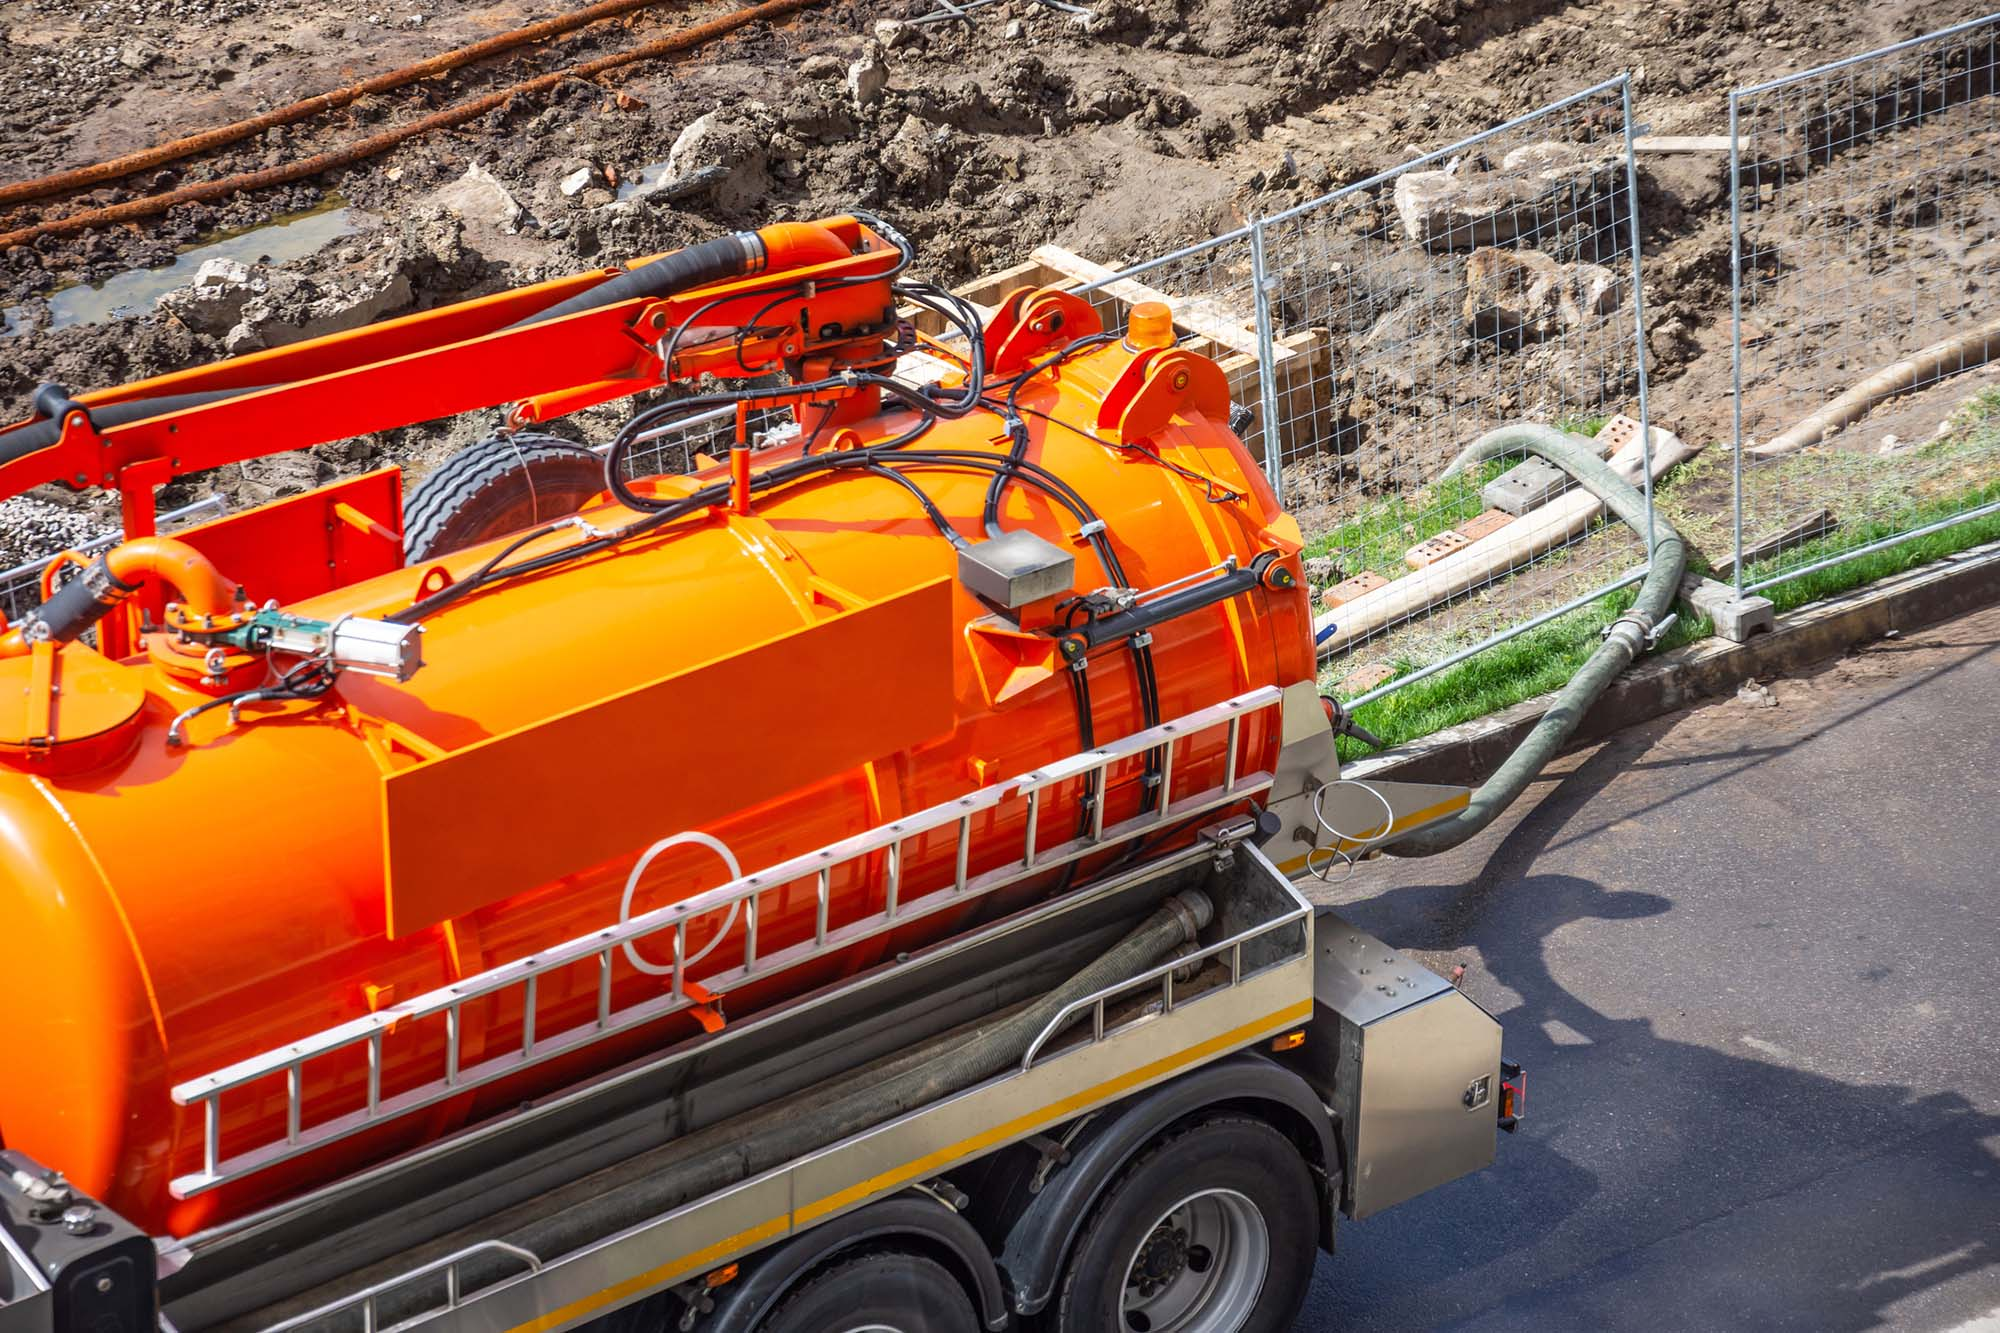 Orange Septic Tank Cleaning van cleaning building site